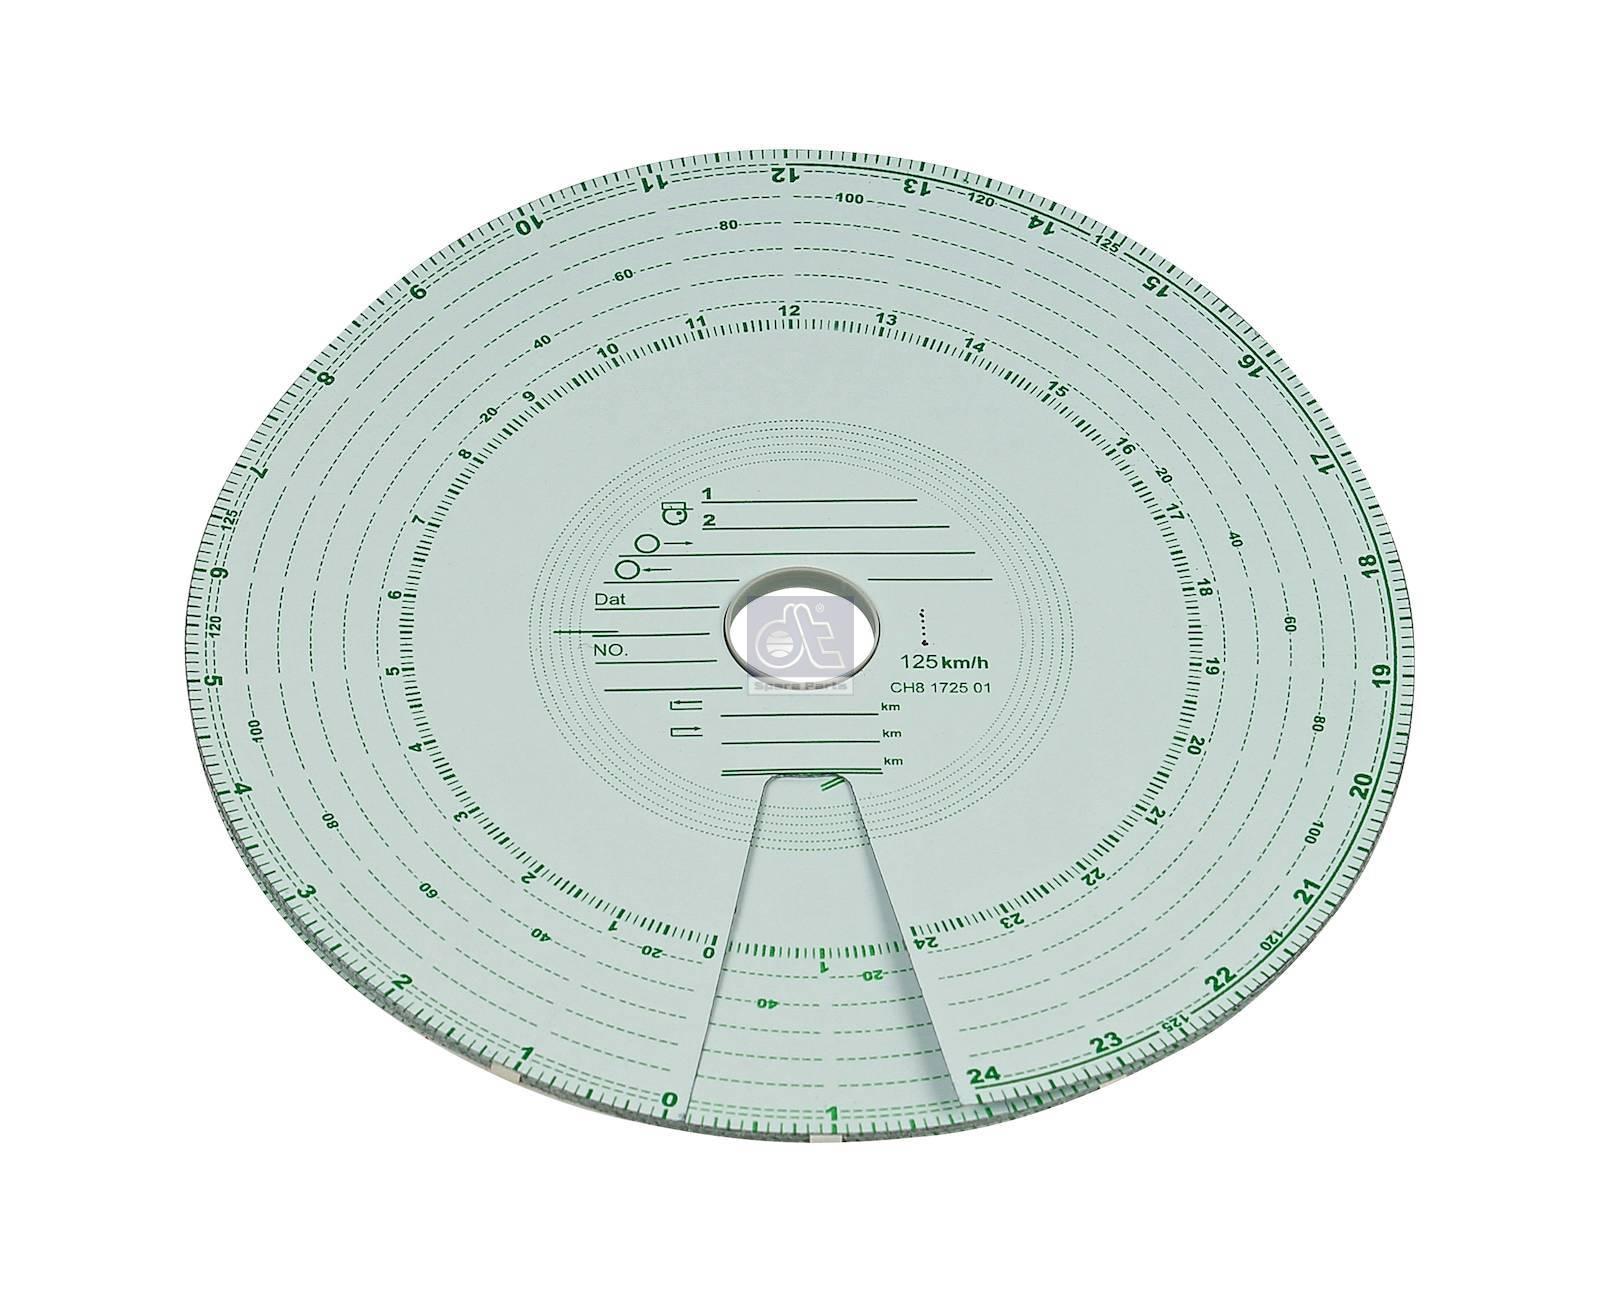 Tachograph disc set